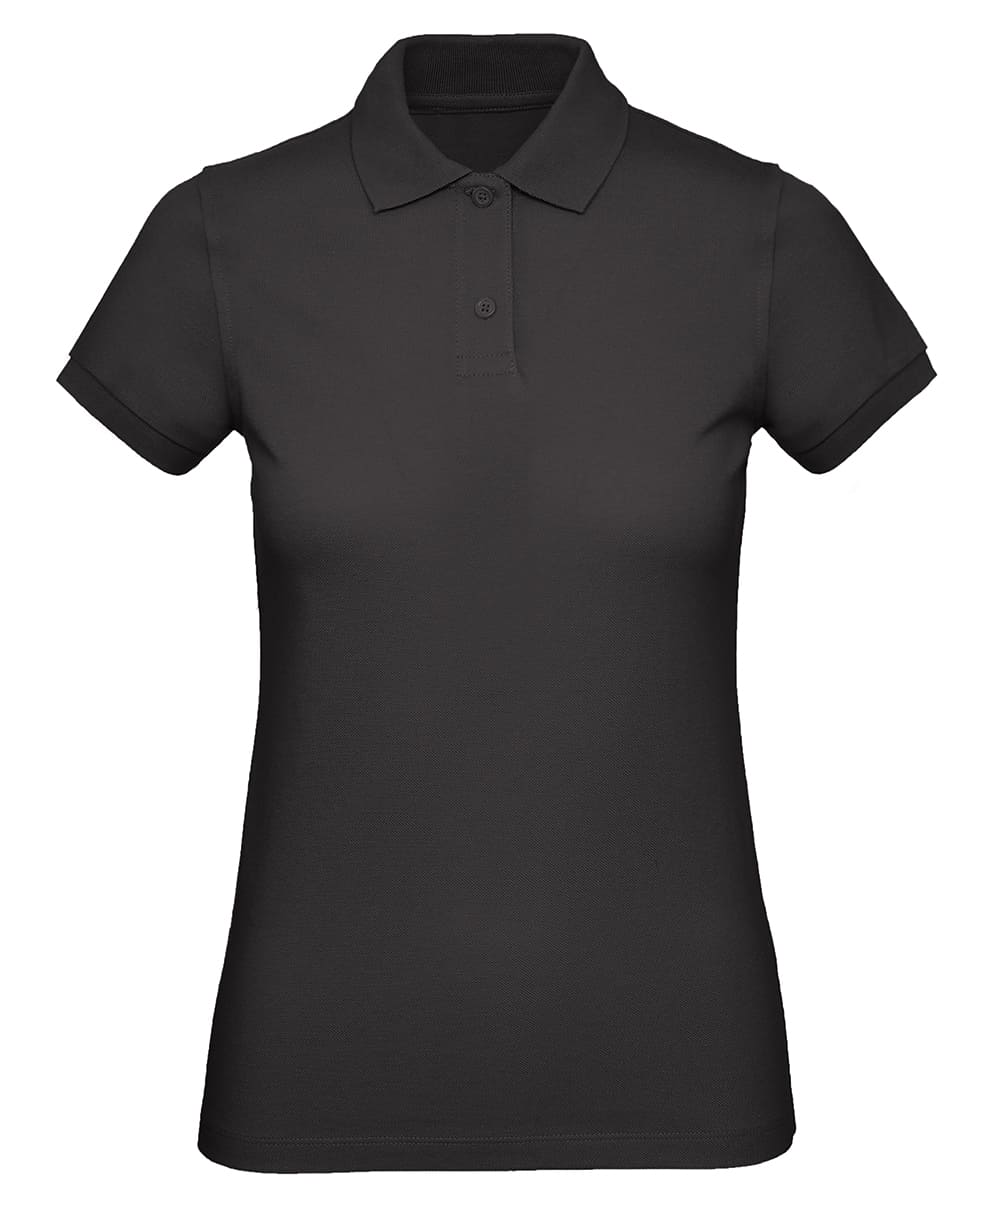 Damen/Frauen Polo T-Shirt